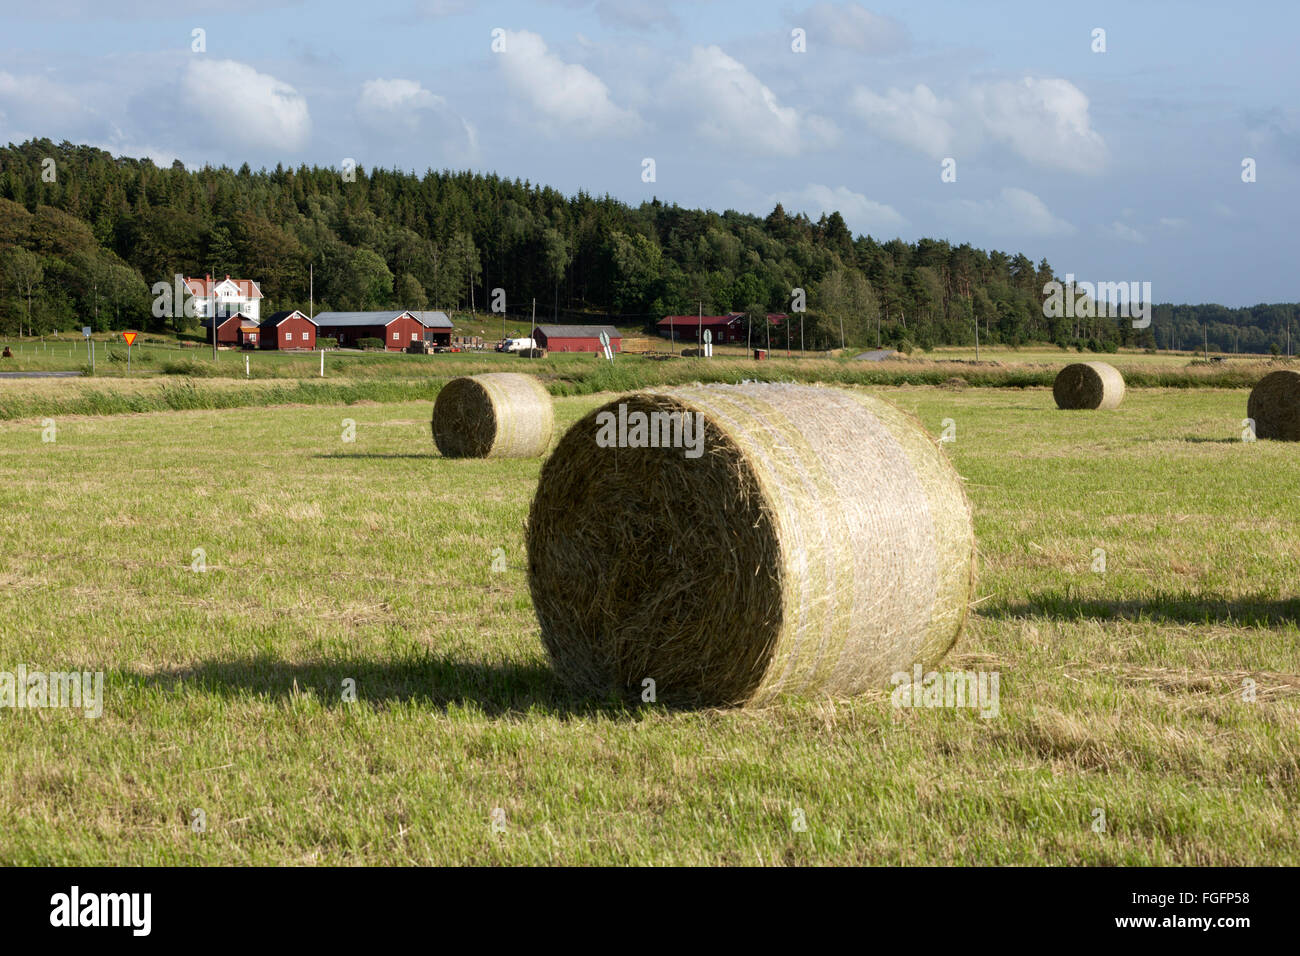 Typical Swedish farm with round hay bales, near Kode, Bohuslän, southwest Sweden, Sweden, Scandinavia, Europe - Stock Image